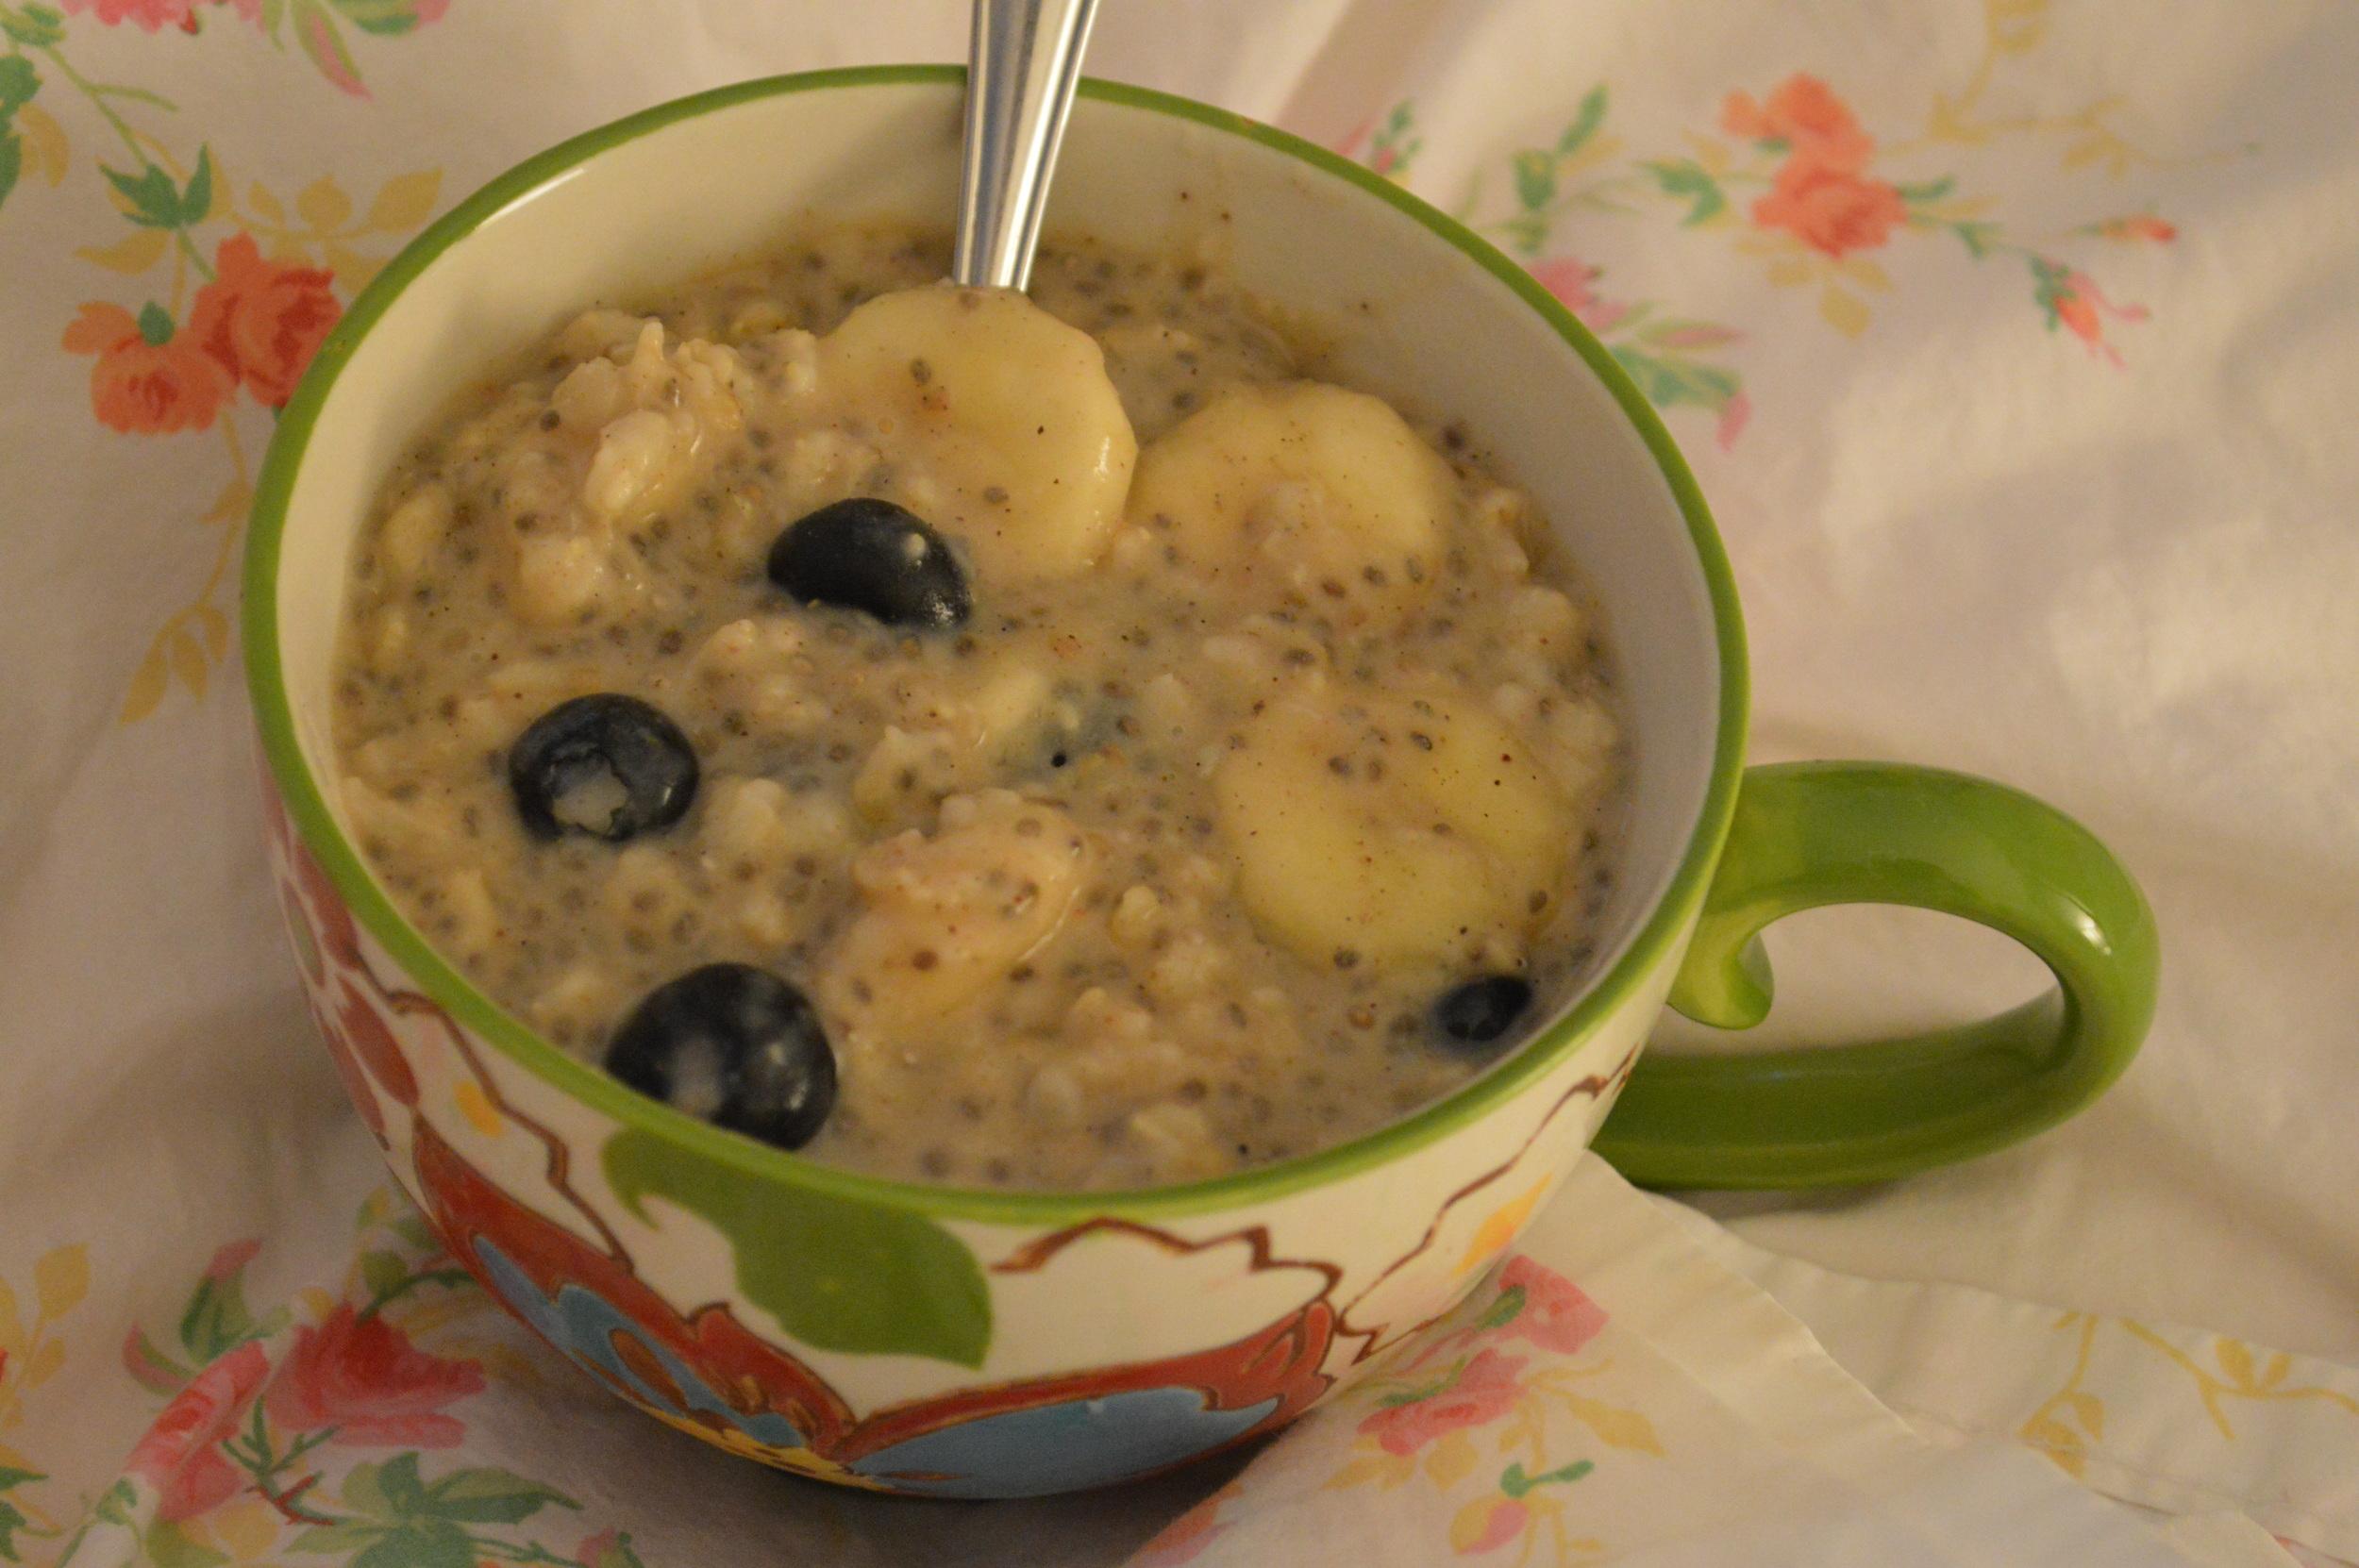 Banana, Blueberry & Chia Seed Oatmeal